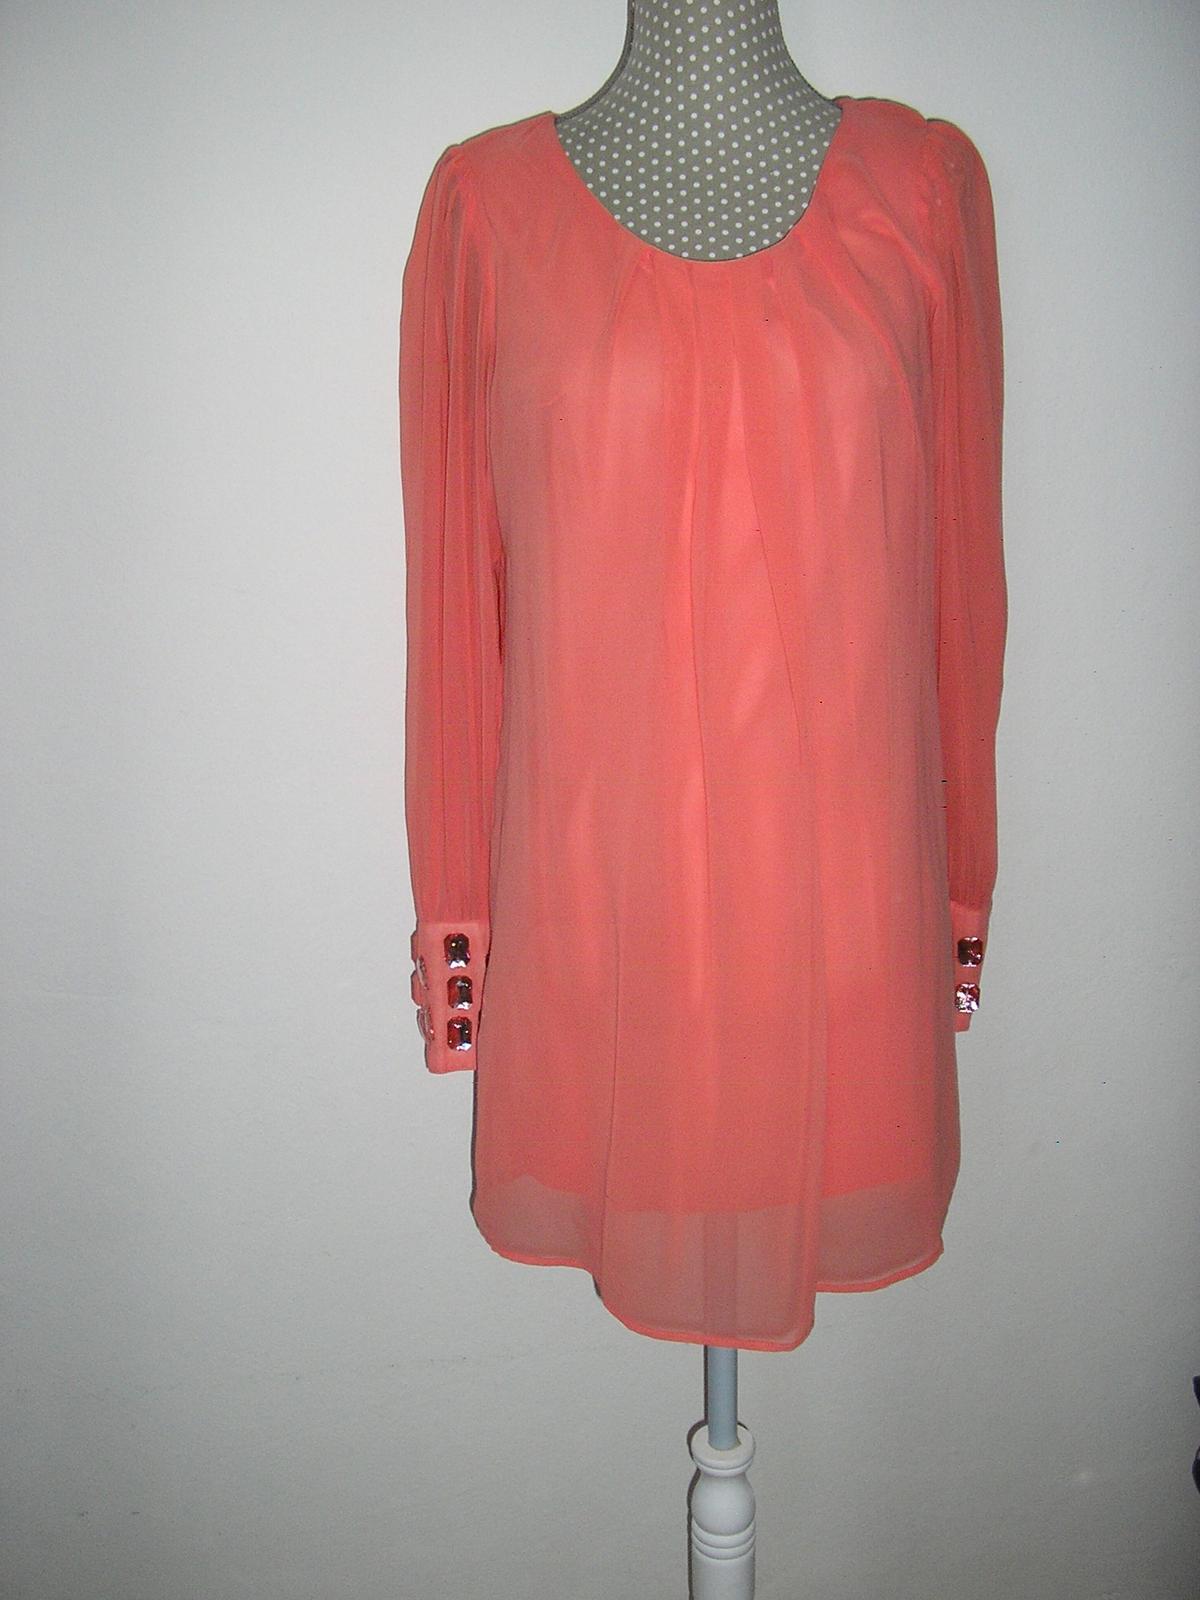 758. Šaty, tunika - Obrázok č. 1